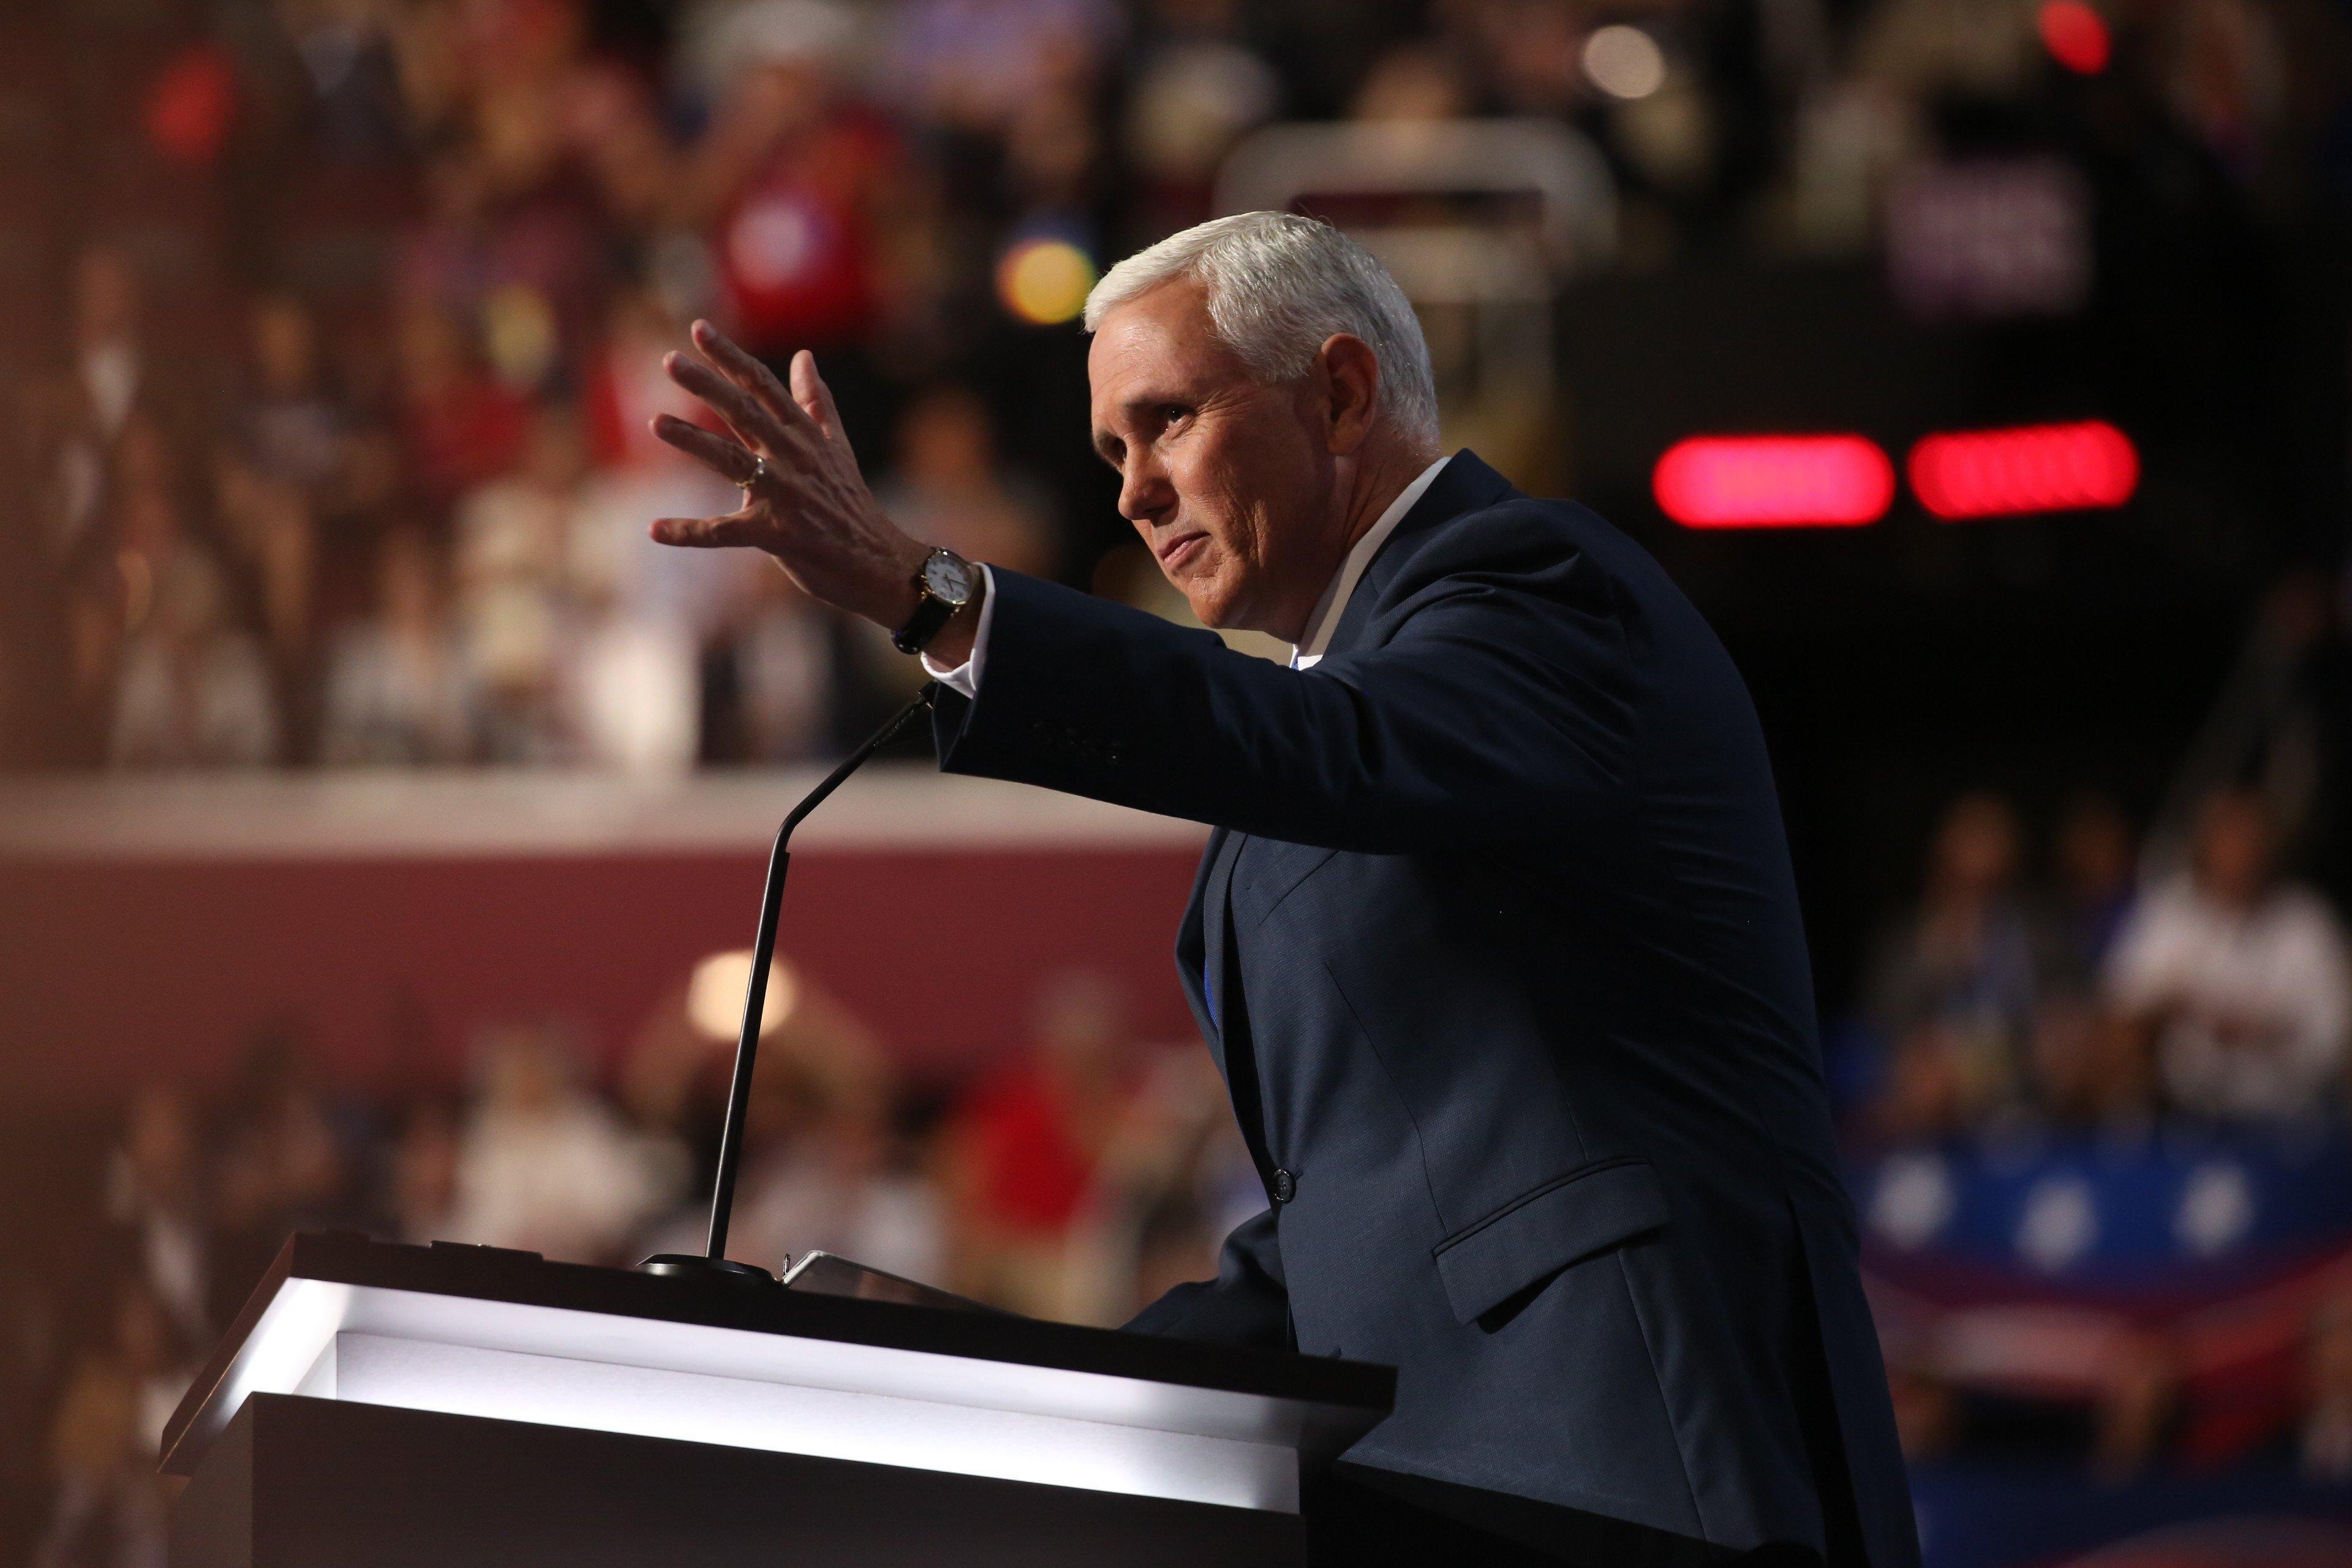 Kaine, Pence prepare for undercard debate